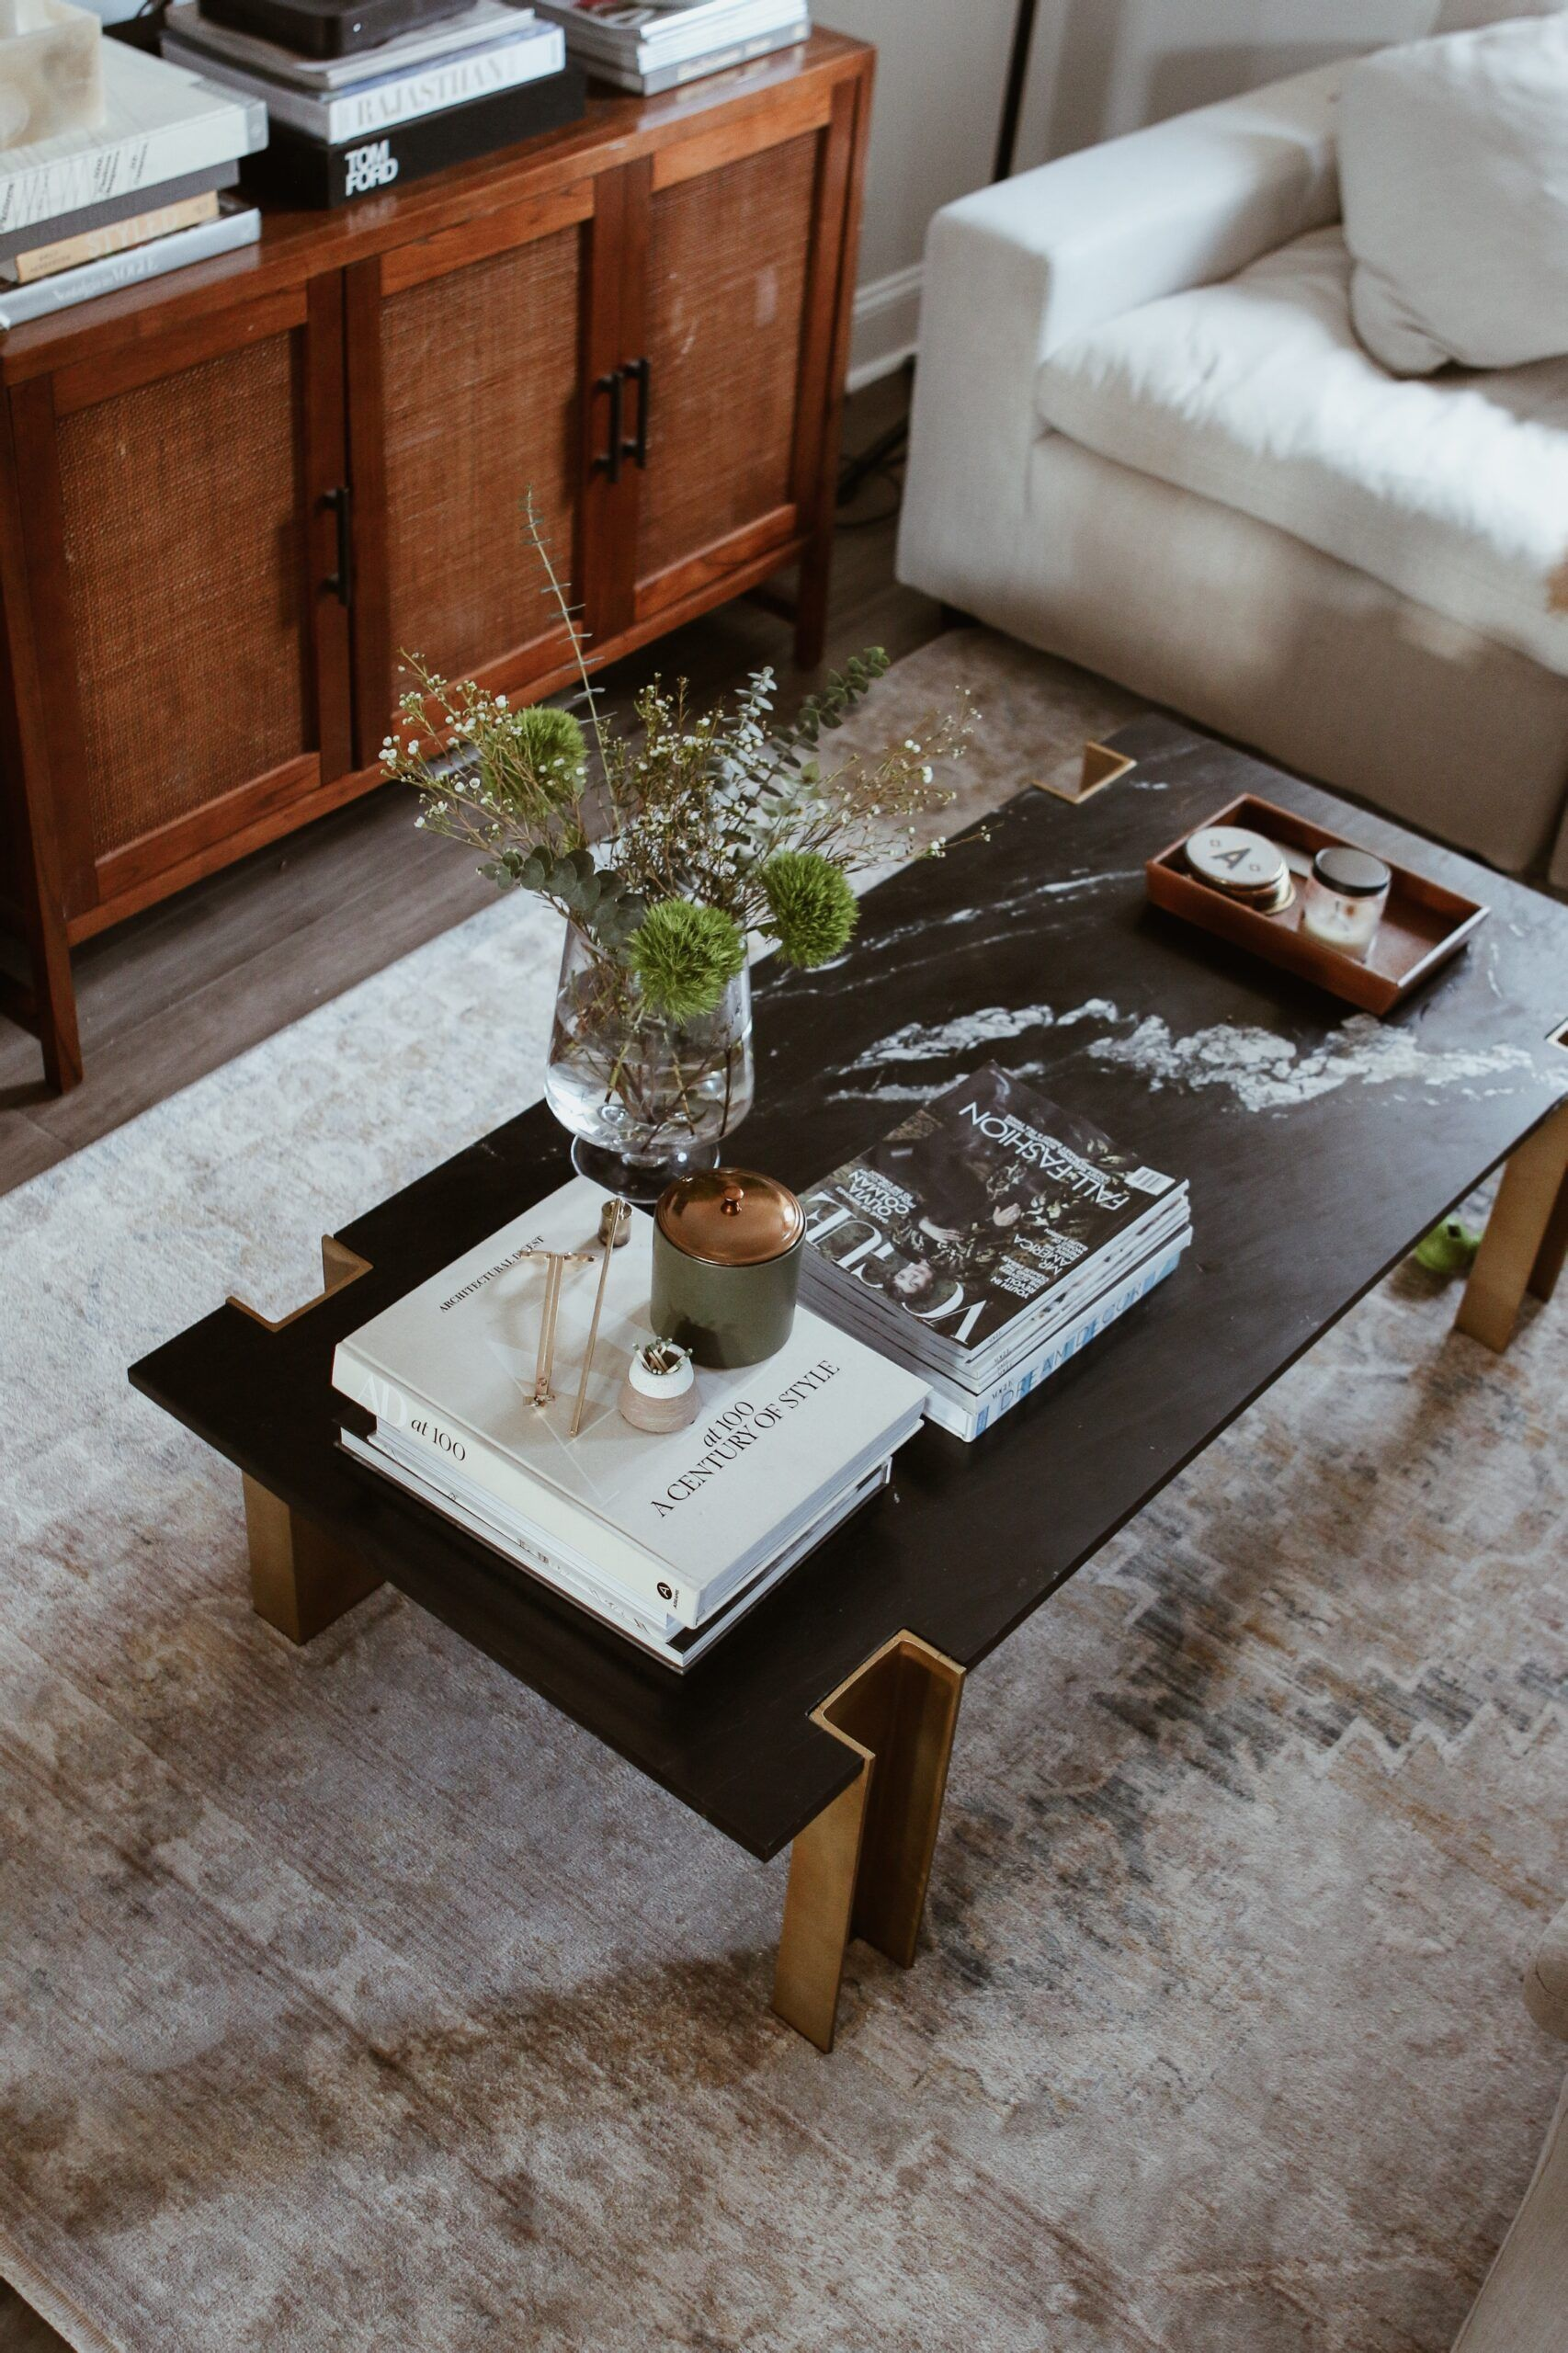 Coffee Table Books Coffee Table Coffee Table Books Table [ 2560 x 1706 Pixel ]